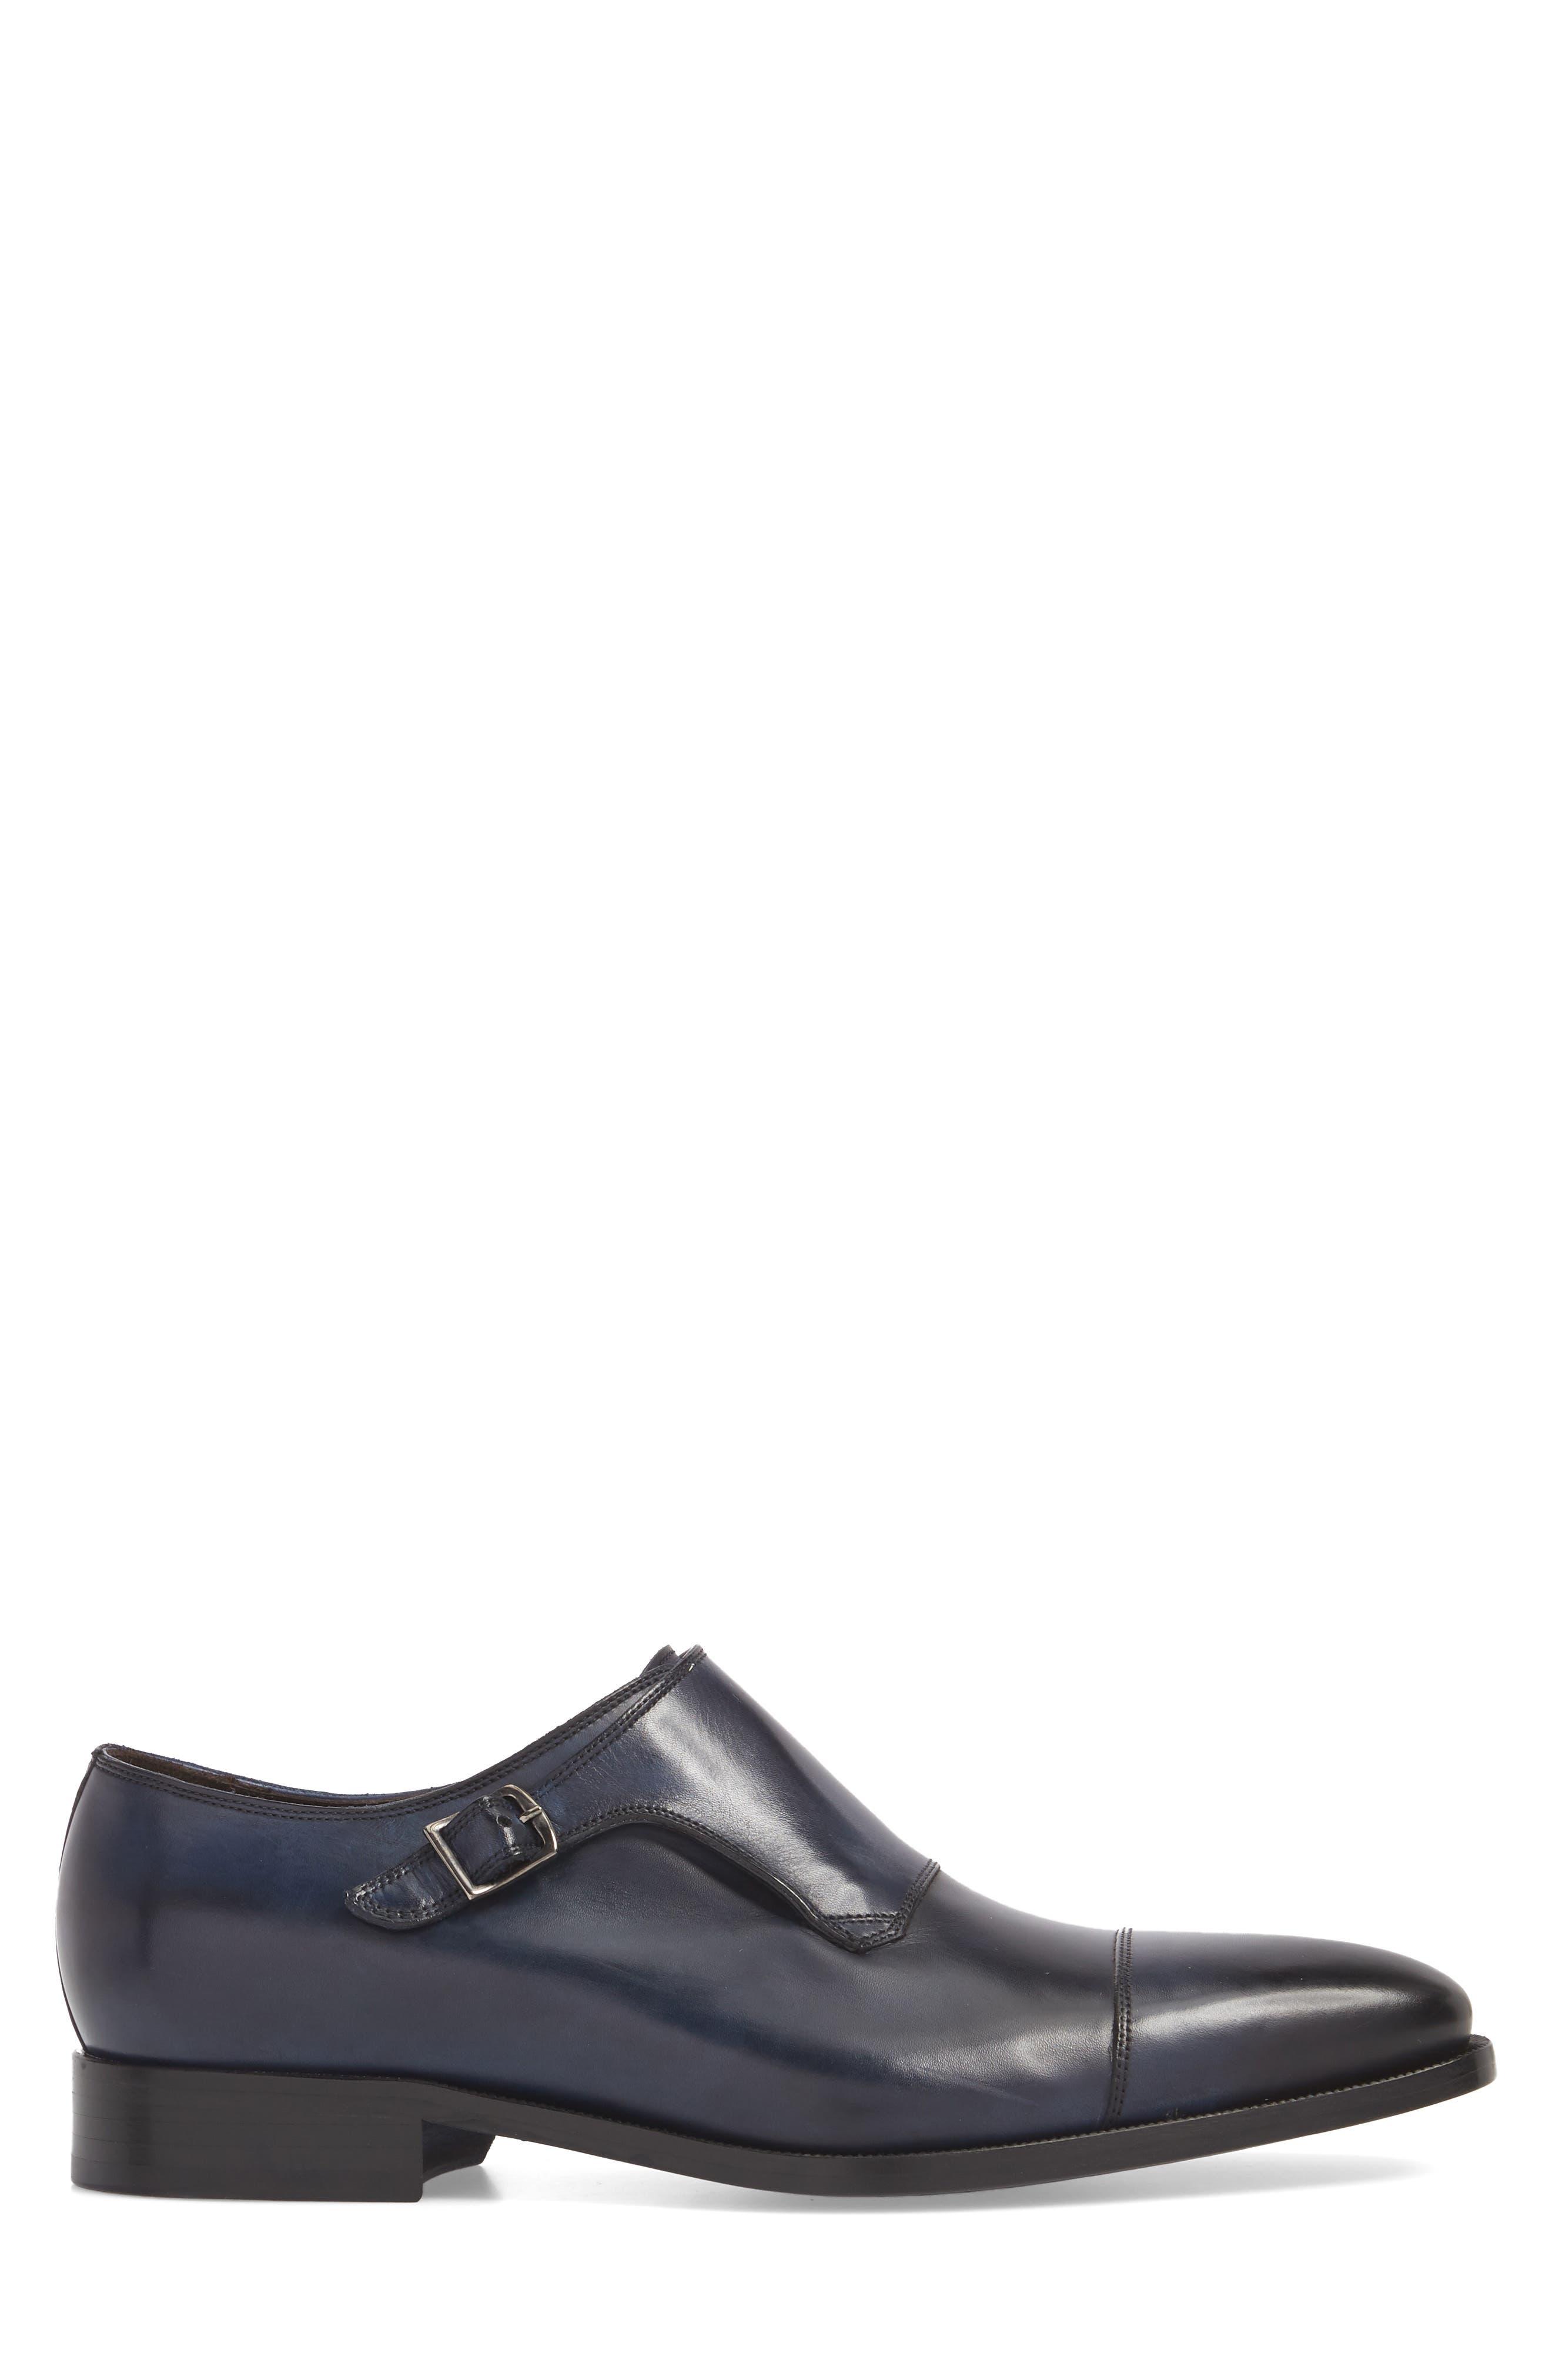 Ludlum Cap Toe Monk Shoe,                             Alternate thumbnail 3, color,                             Blue Leather